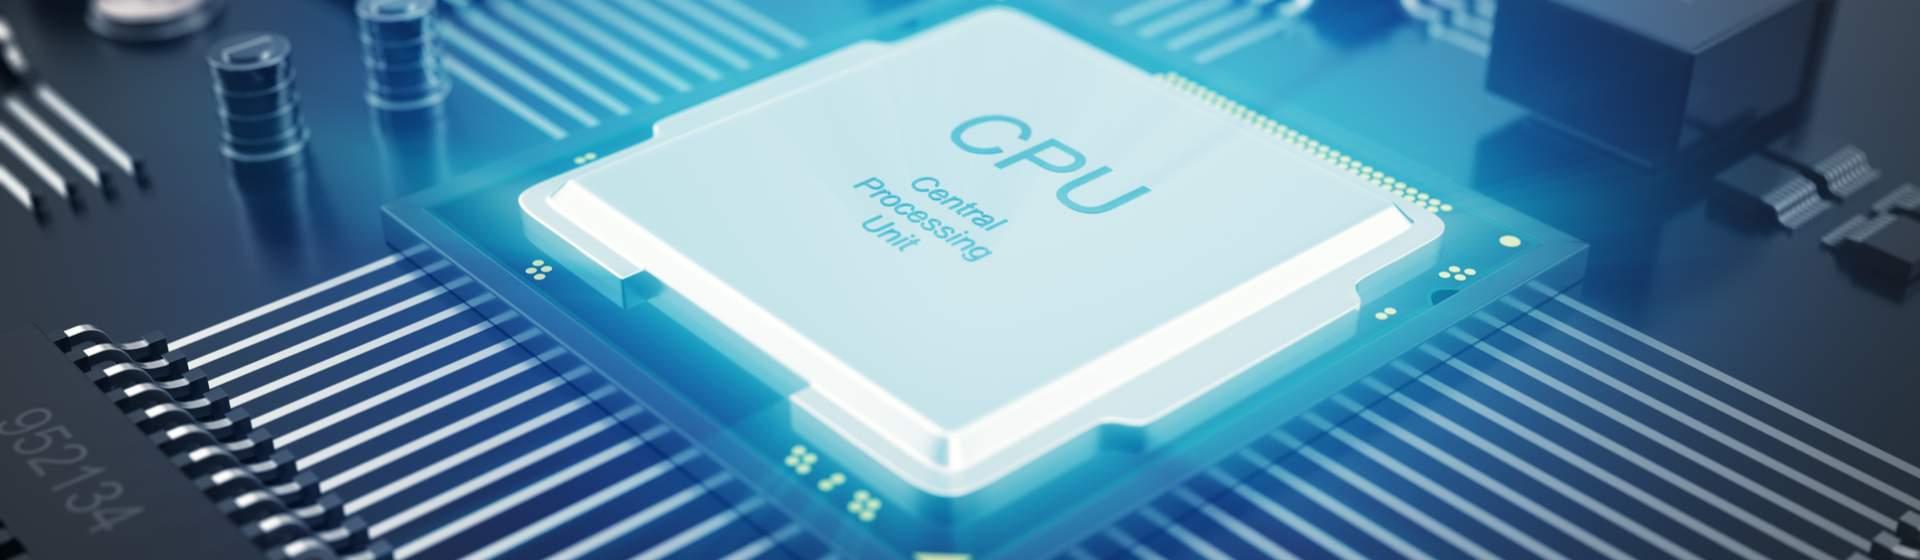 O que é CPU e para que serve?